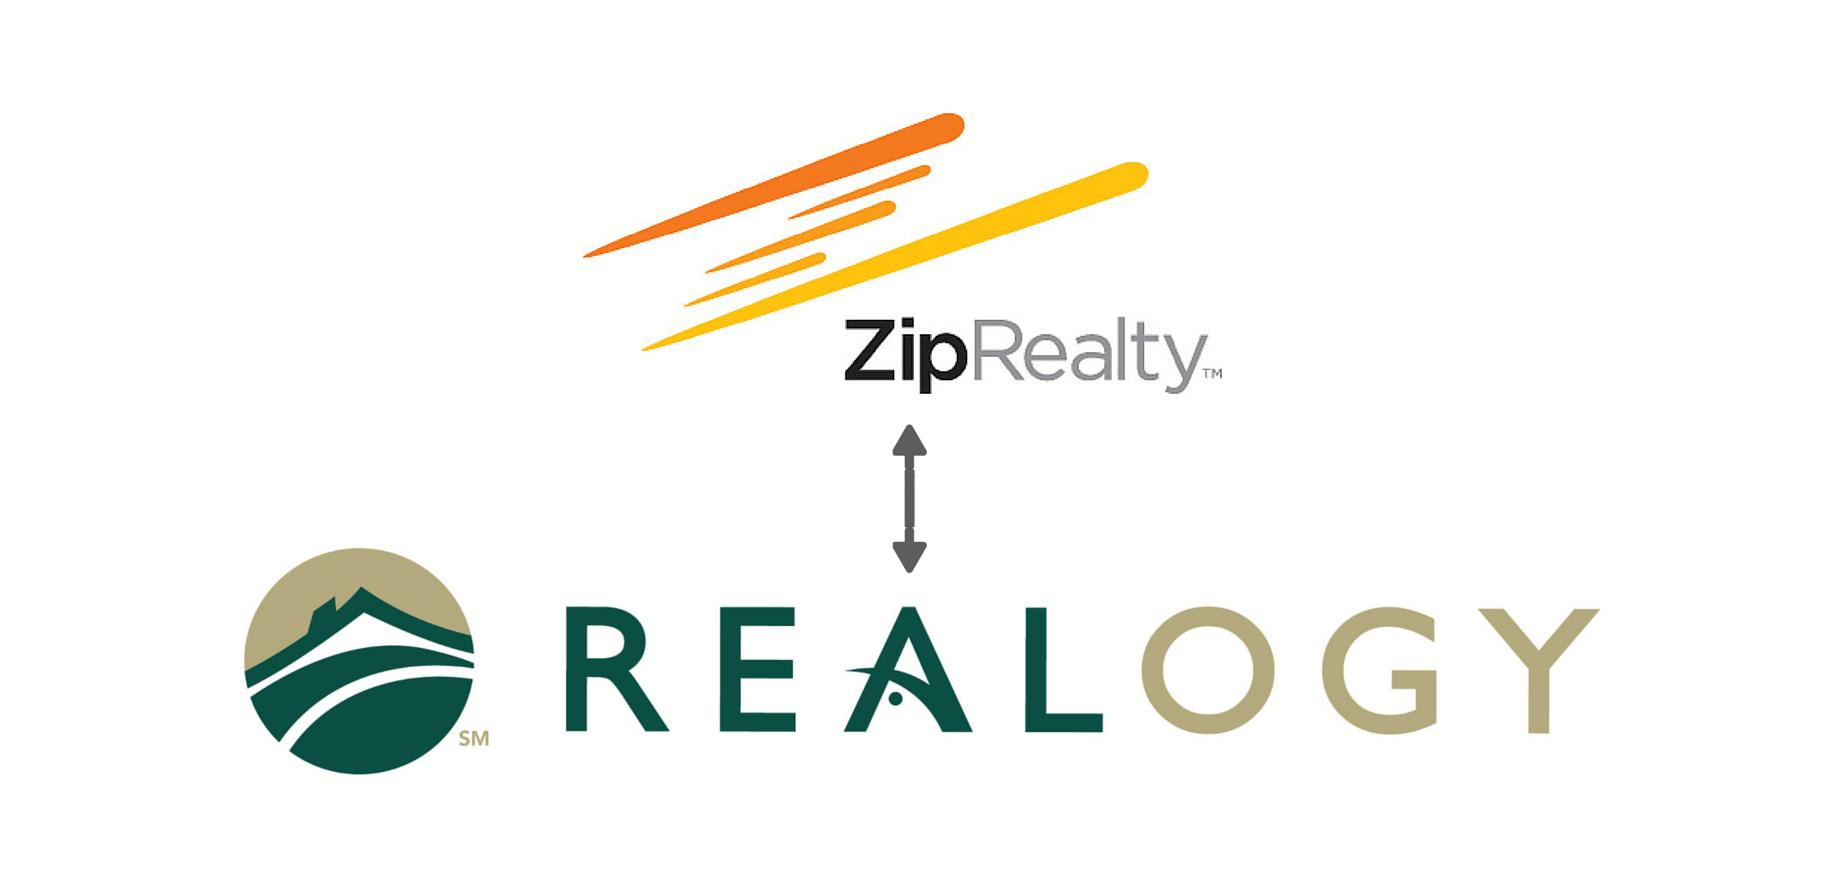 ZipRealty